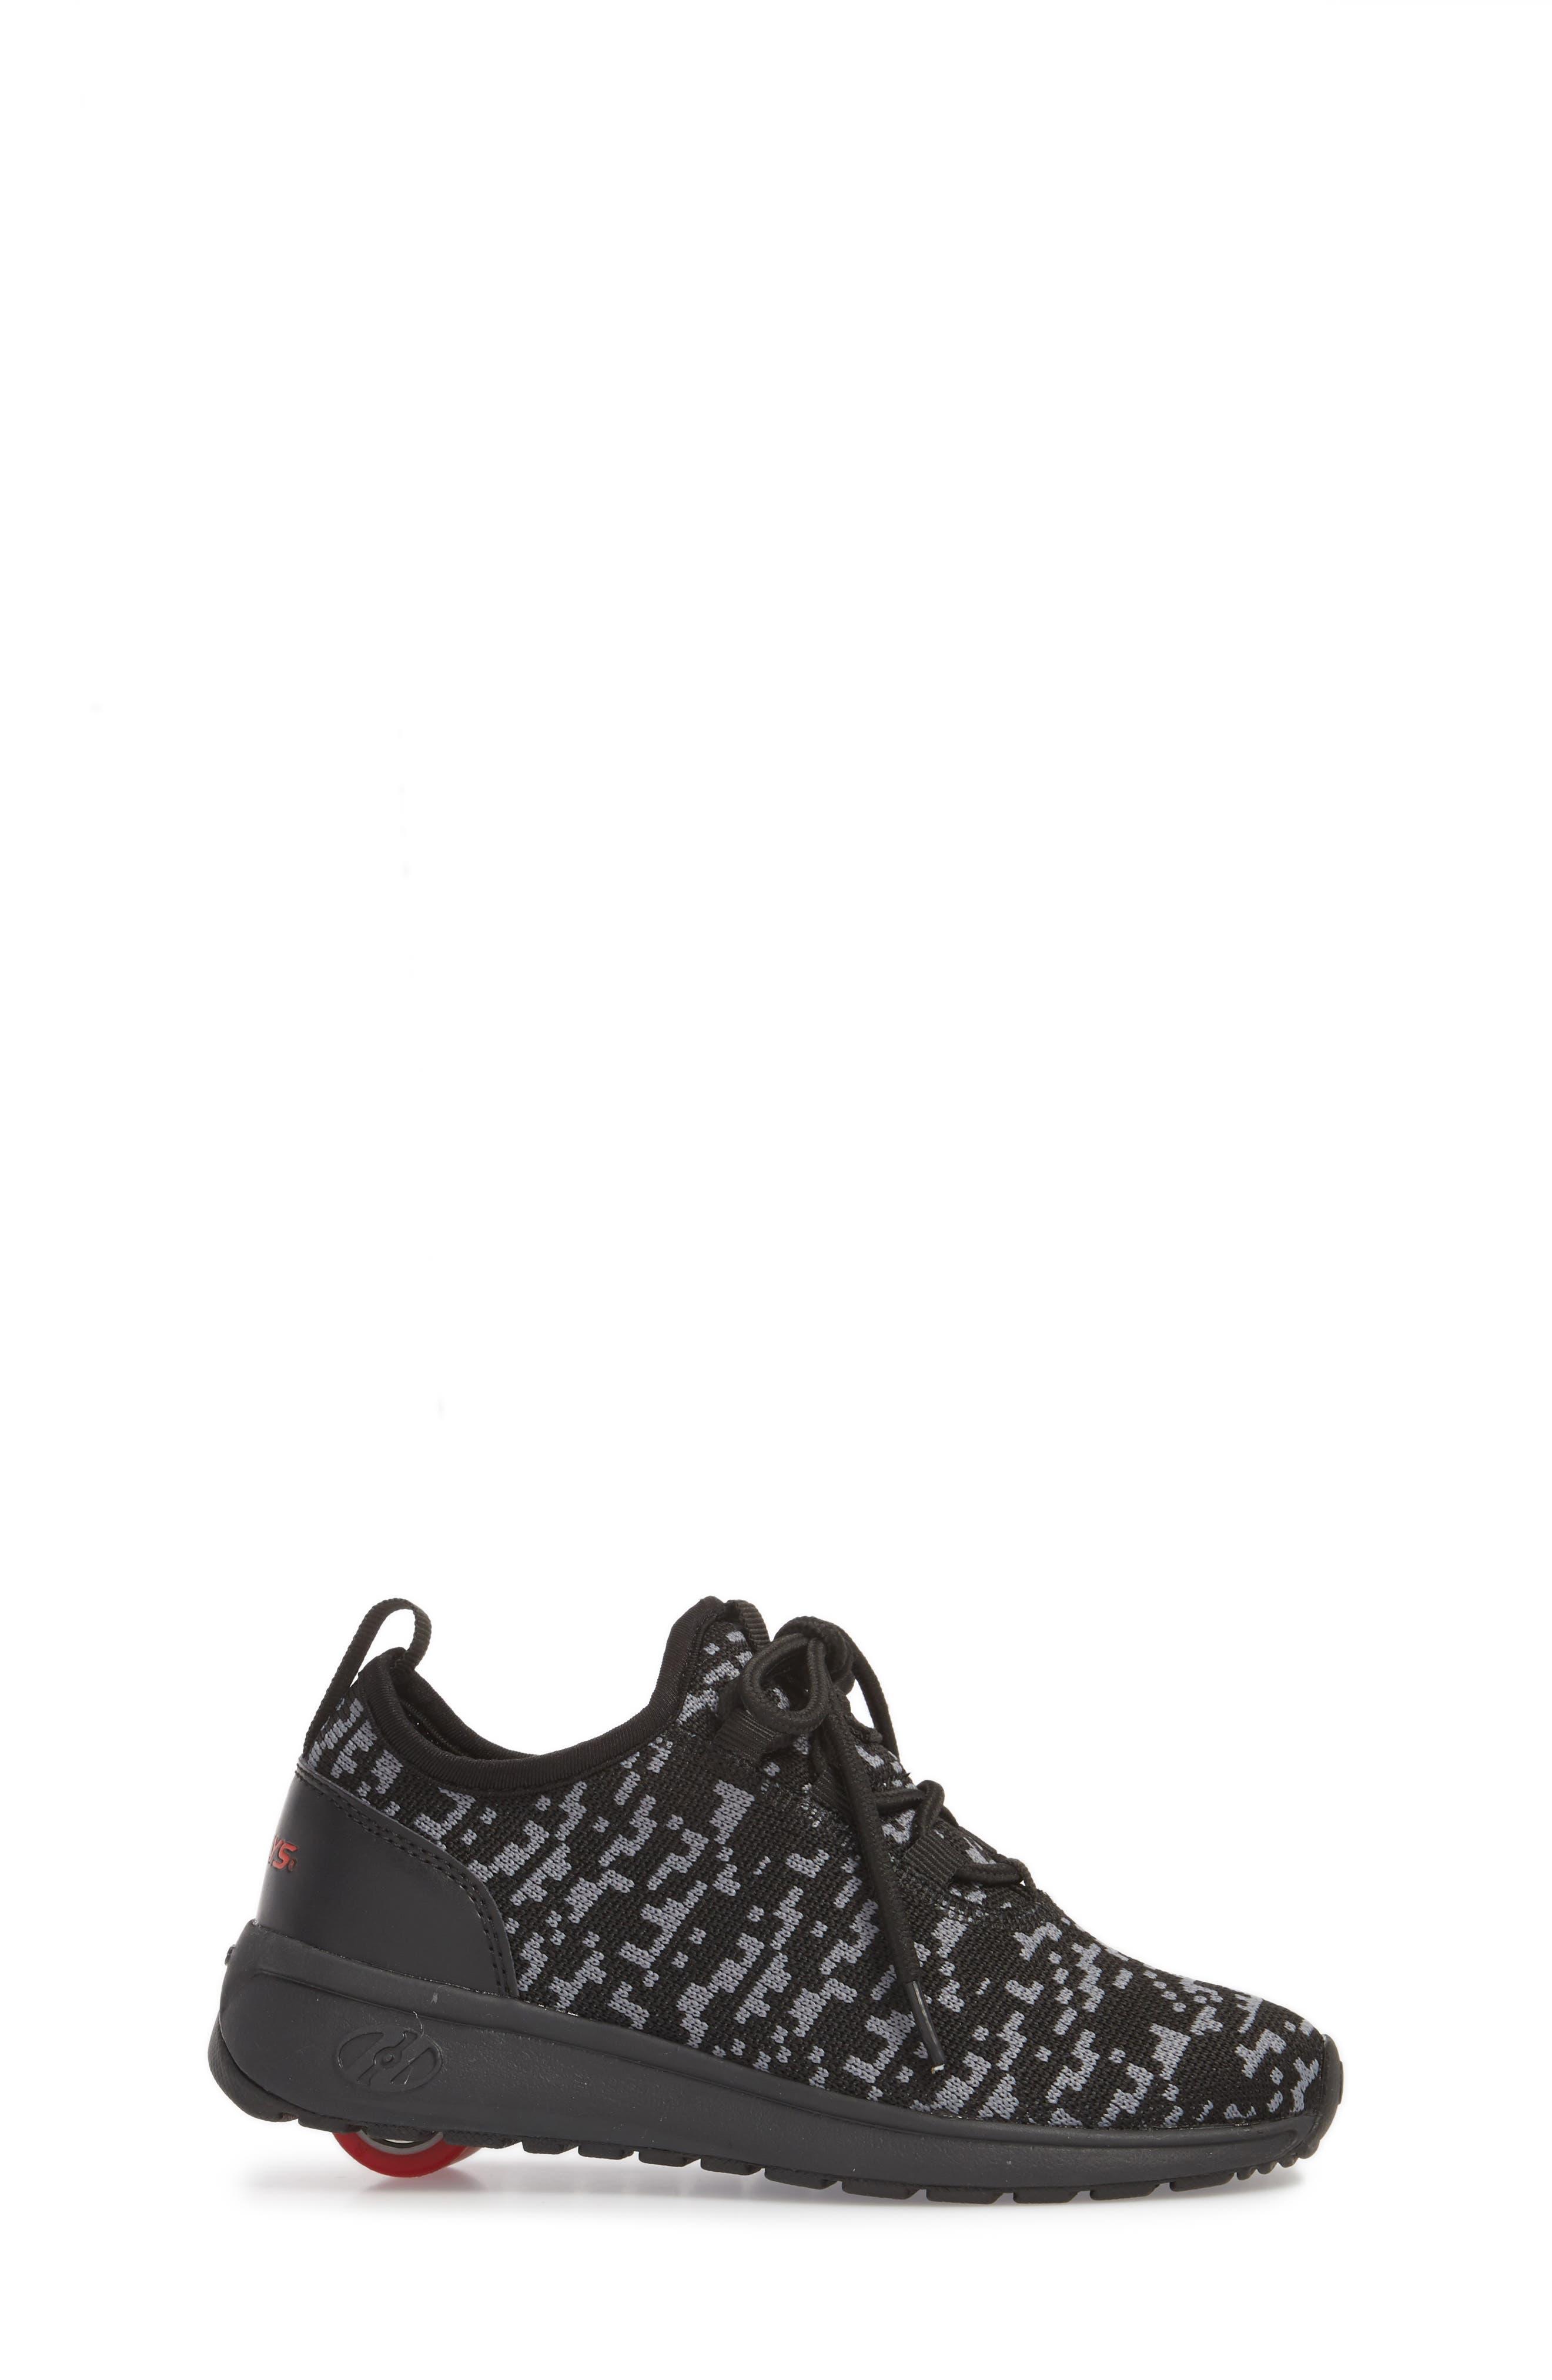 Player Sneaker,                             Alternate thumbnail 6, color,                             Black/ Red